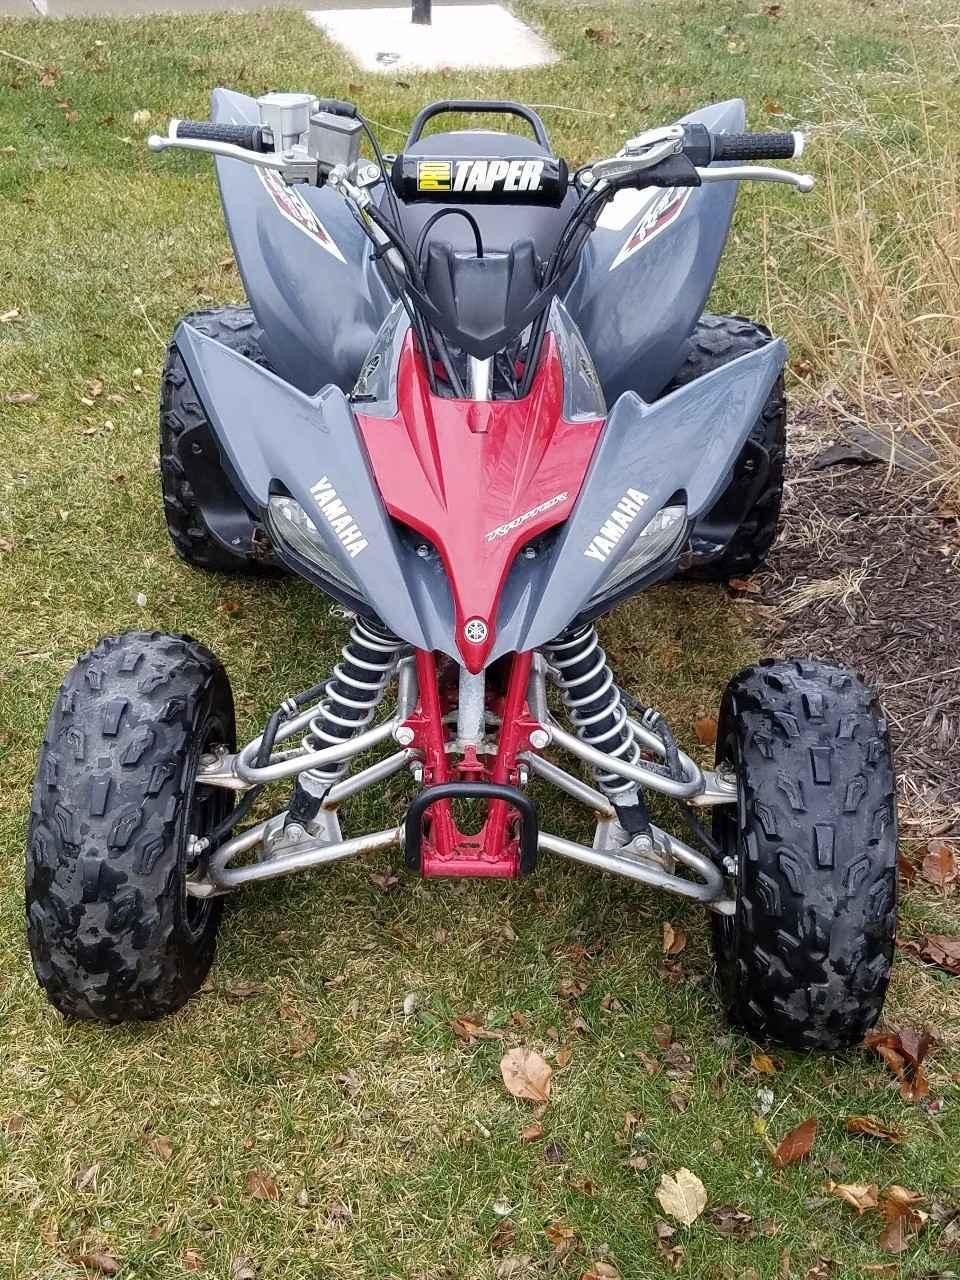 Used 2008 Yamaha RAPTOR 250 ATVs For Sale in Nebraska on atvtrades com